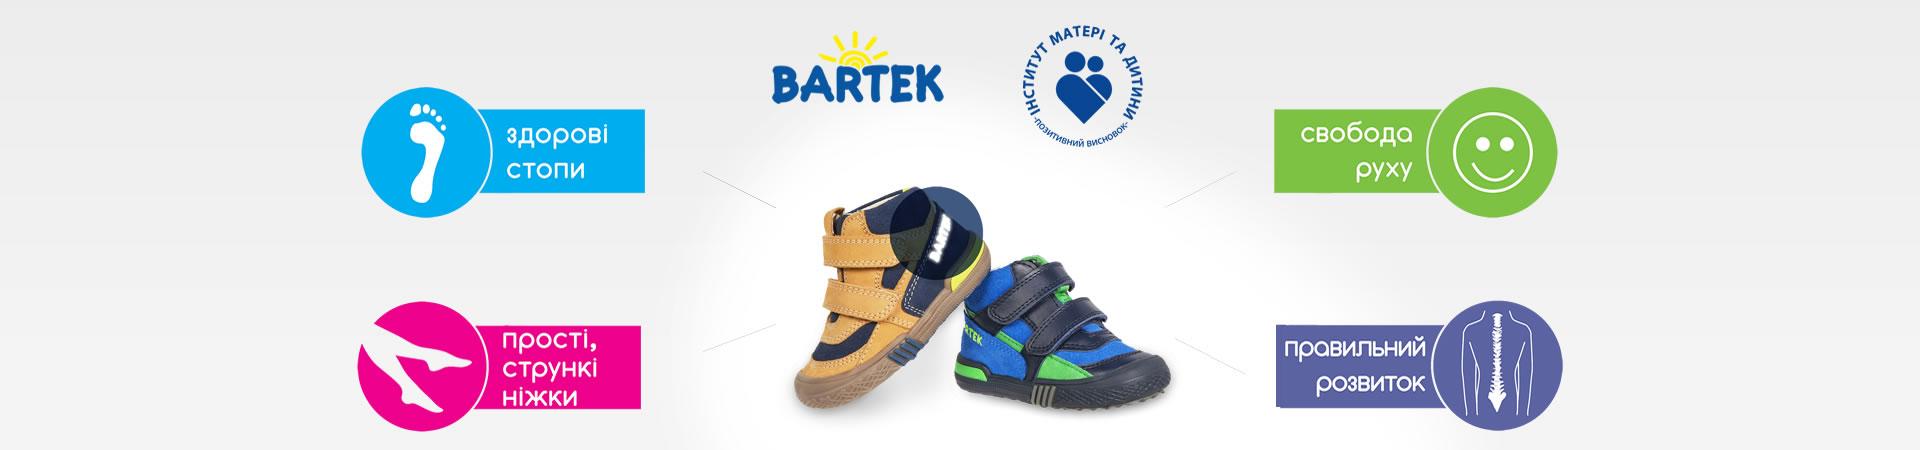 Dlaczego Bartek UA